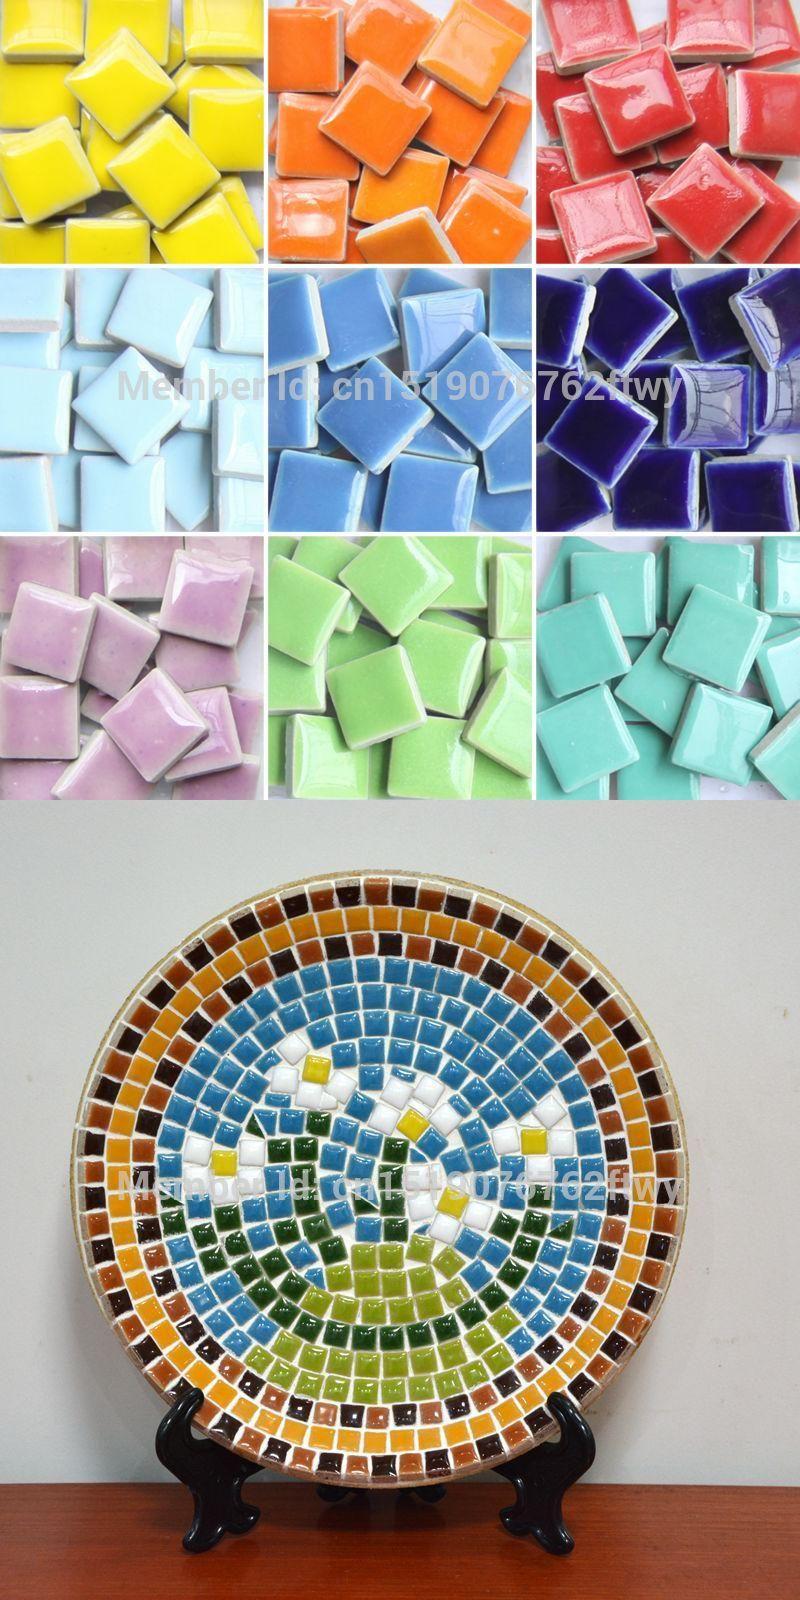 Garden Decorative Tiles Colorful Ceramic Mosaic Tiles 200 Pcs Natural Decorative Stones